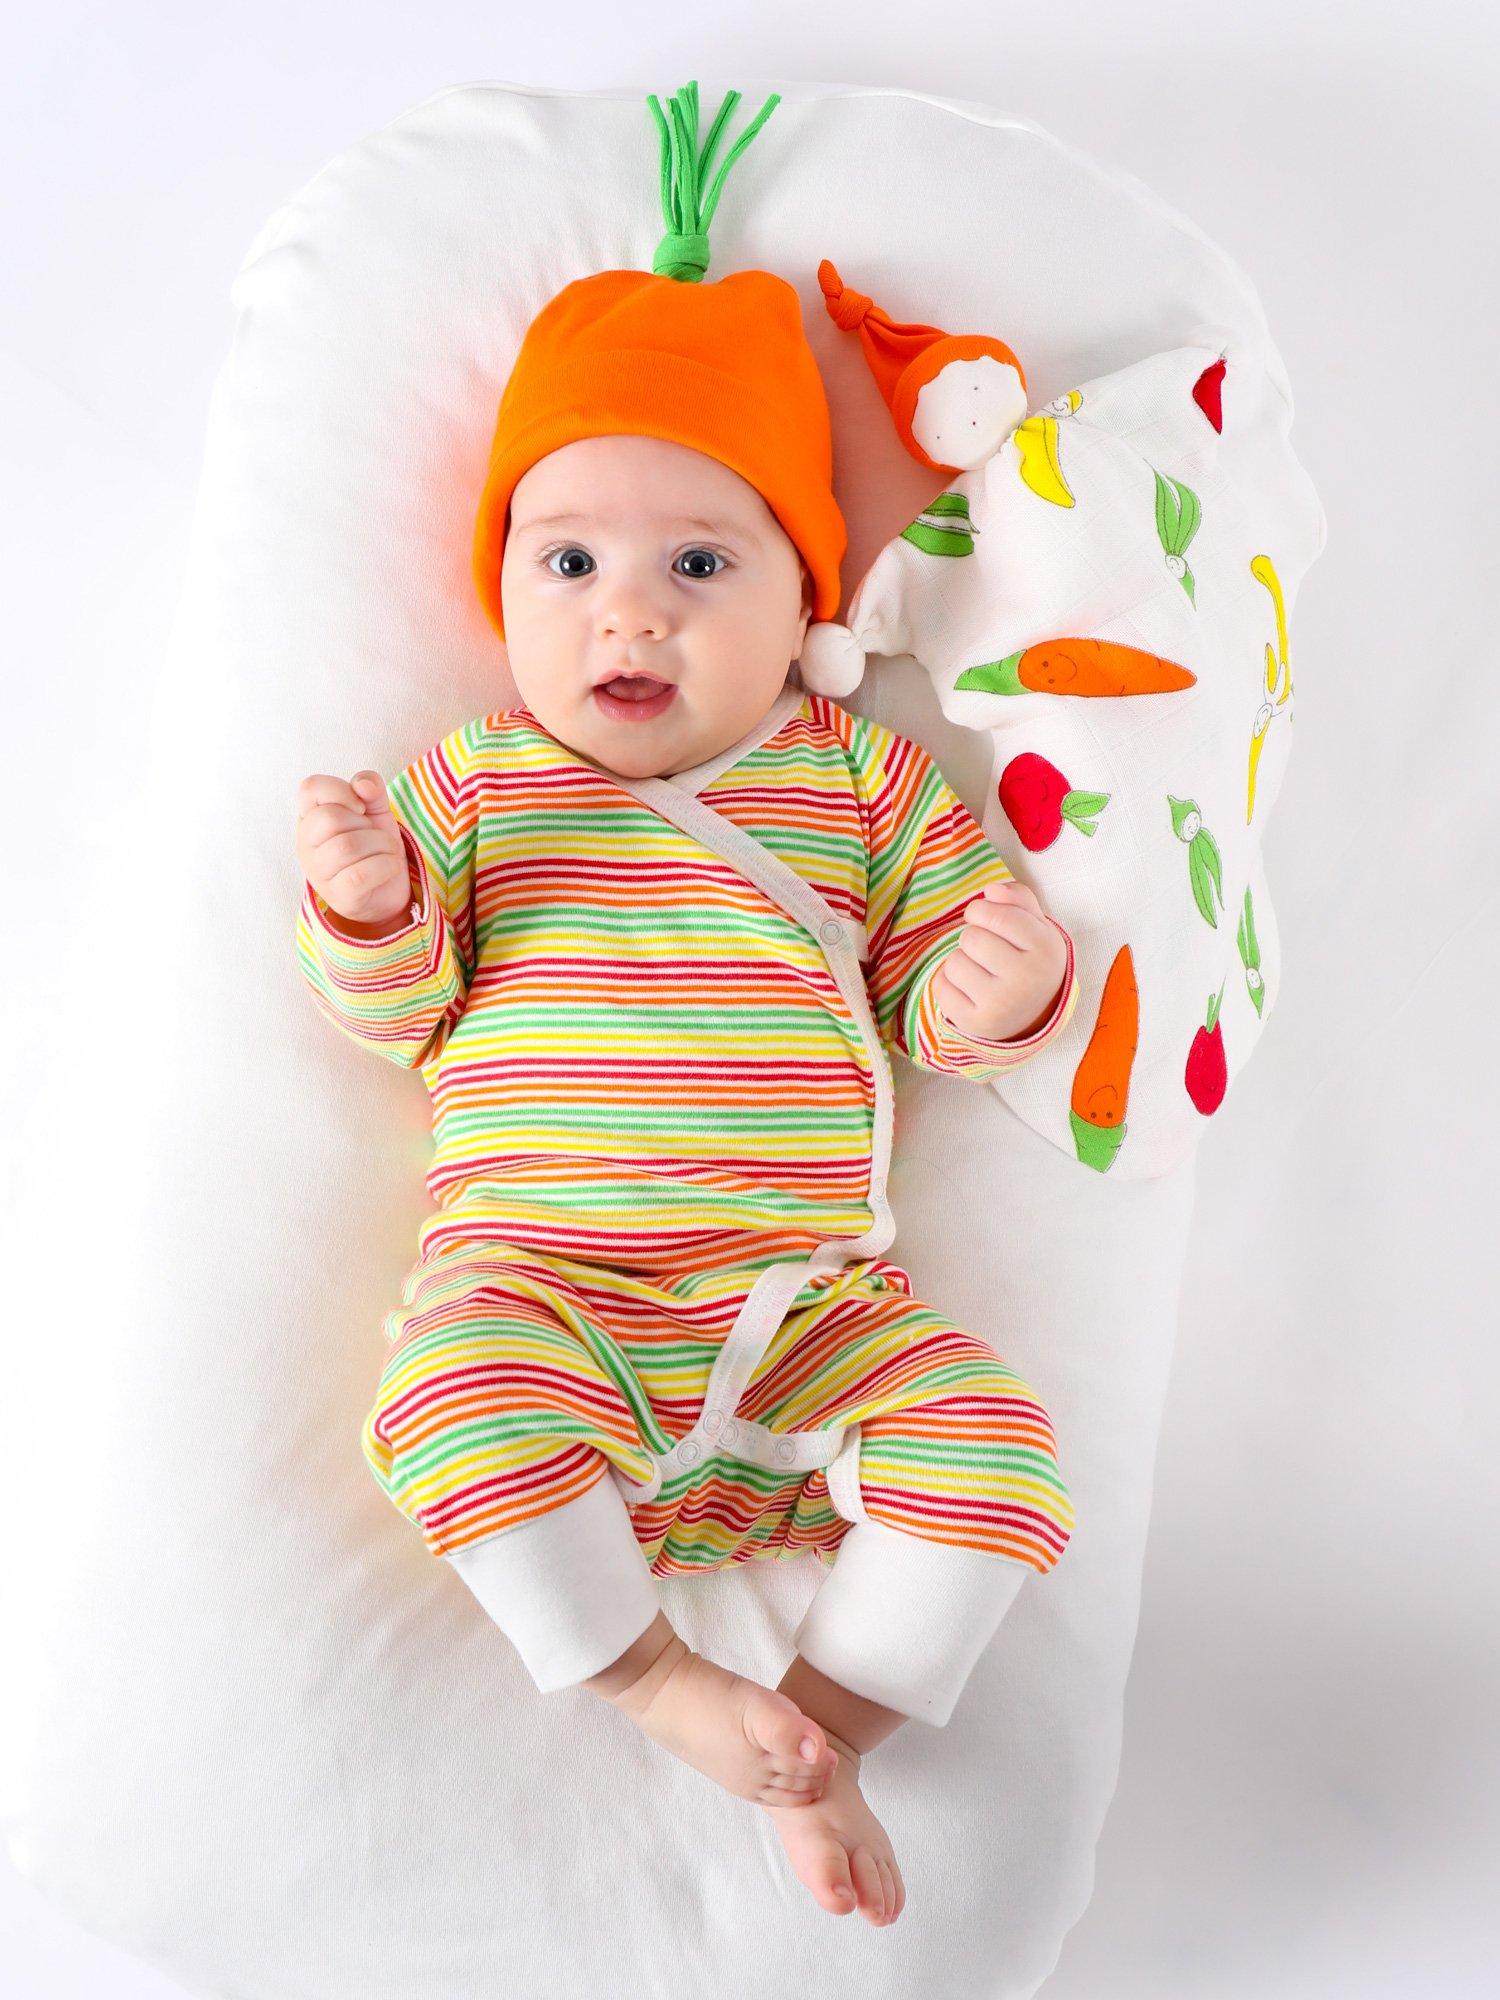 i20-1554-2-organic-cotton-muslin-print-sleeping-doll-lifestyle-f4989959-3407-4e98-8c1a-438965d6e2a7.jpg